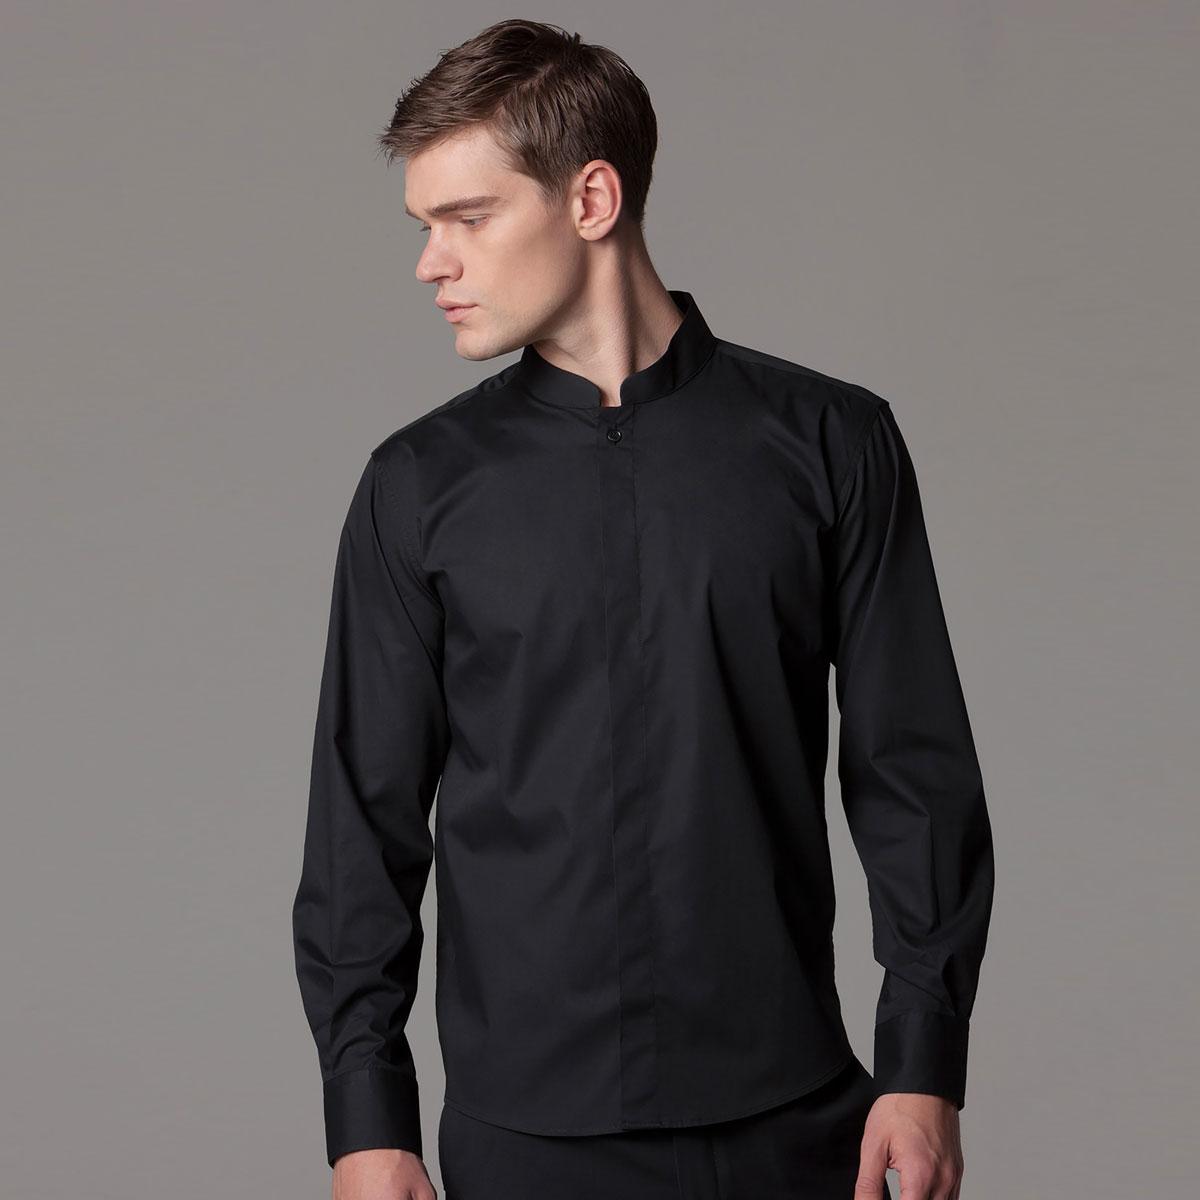 Mandarin Collar Hospitality Shirt Long Sleeve - KK123